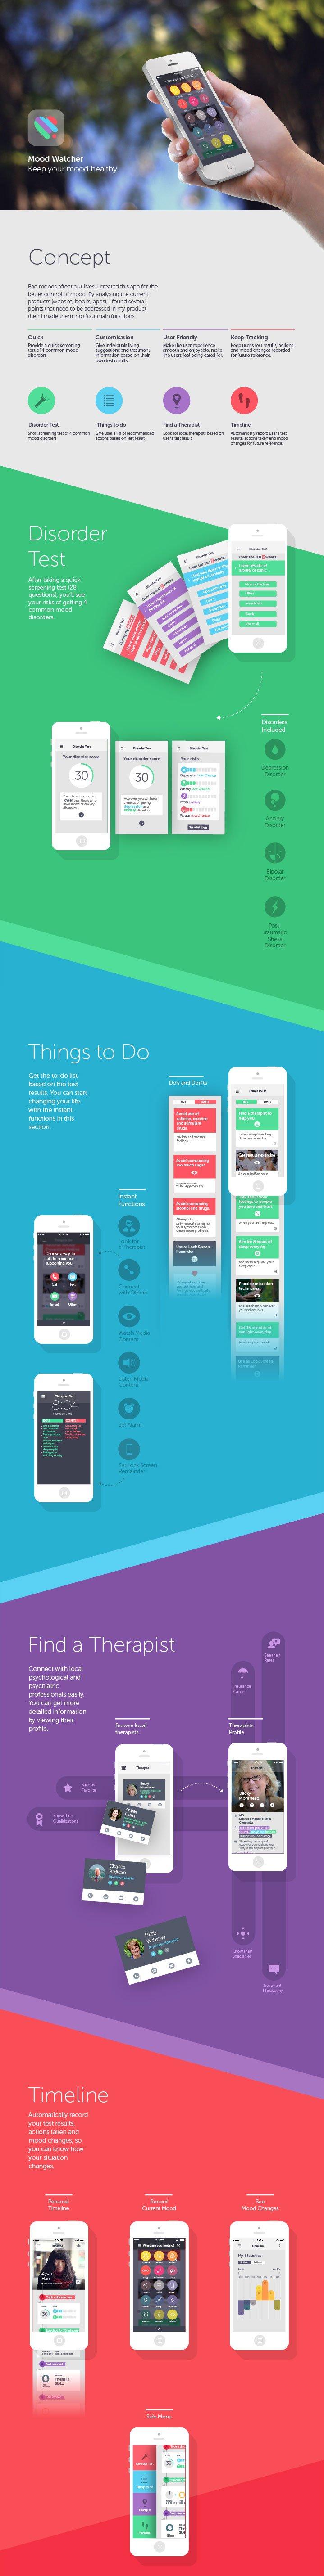 Unique Web Design, Mood Watcher #WebDesign #Design (http://www.pinterest.com/aldenchong/)